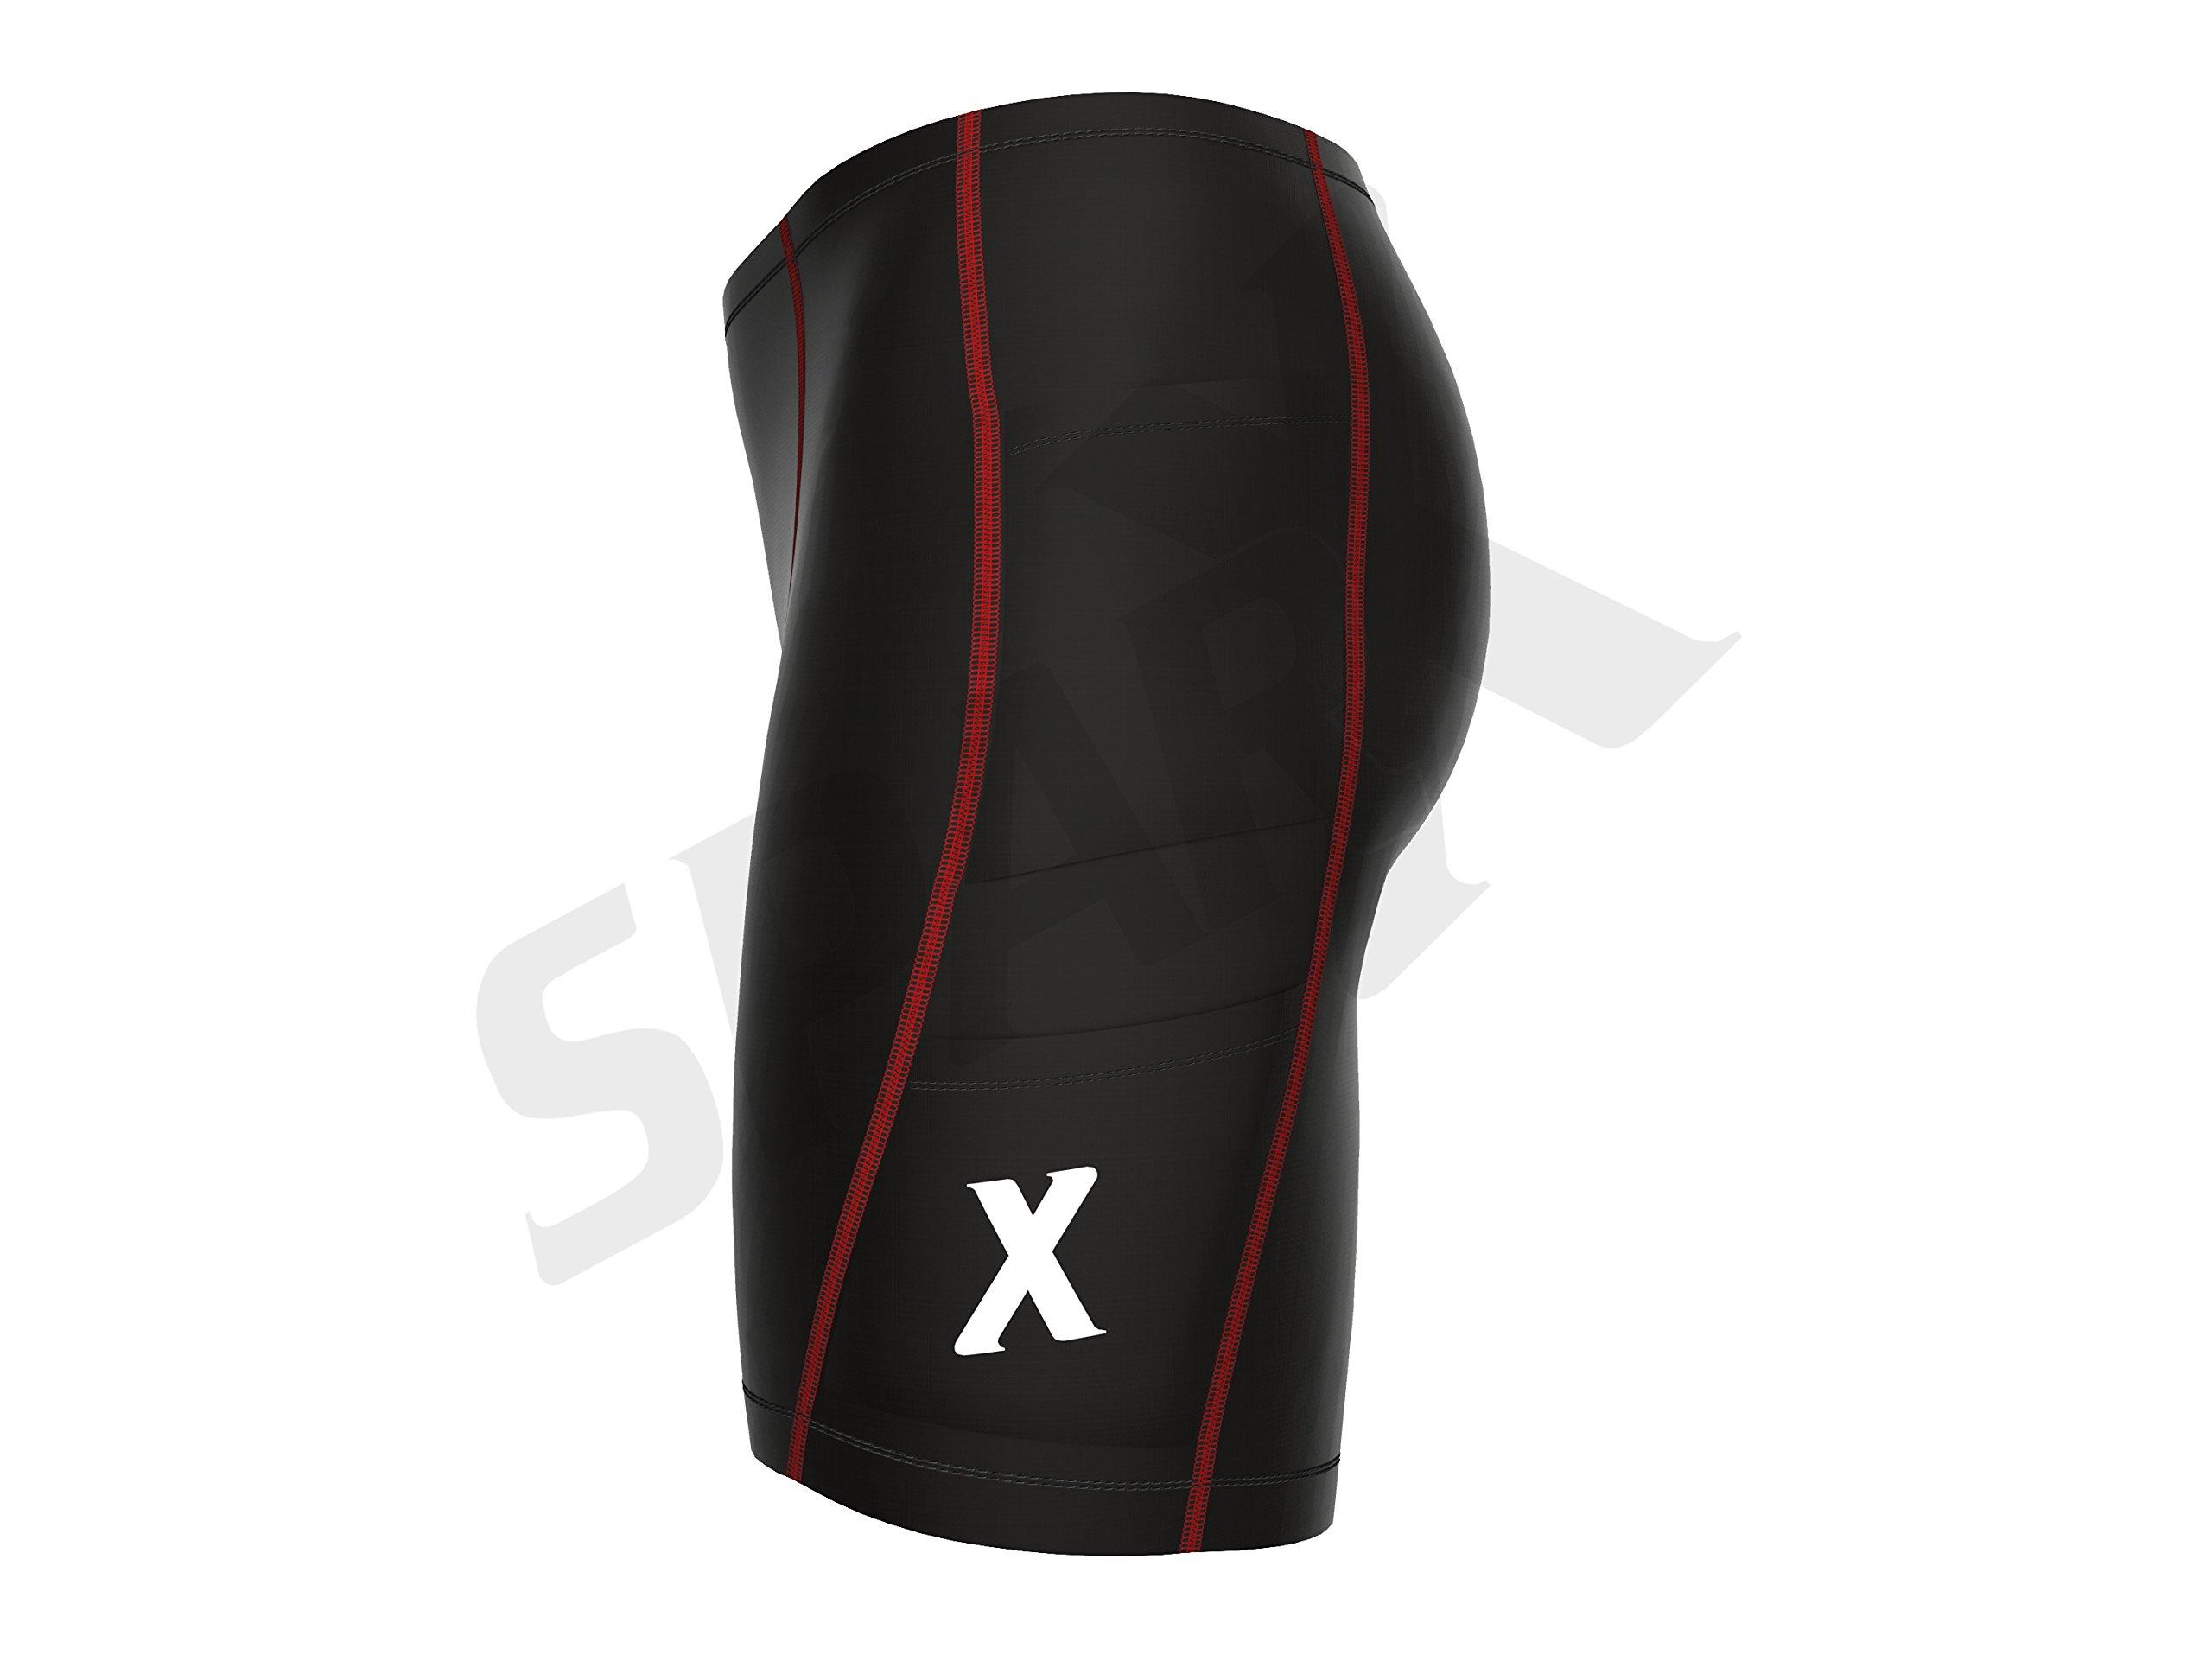 Sparx Energy Compression Triathlon Short Tri Cycling Short Bike Swim Run 7060 (Large, Black/red) by Sparx Sports (Image #4)